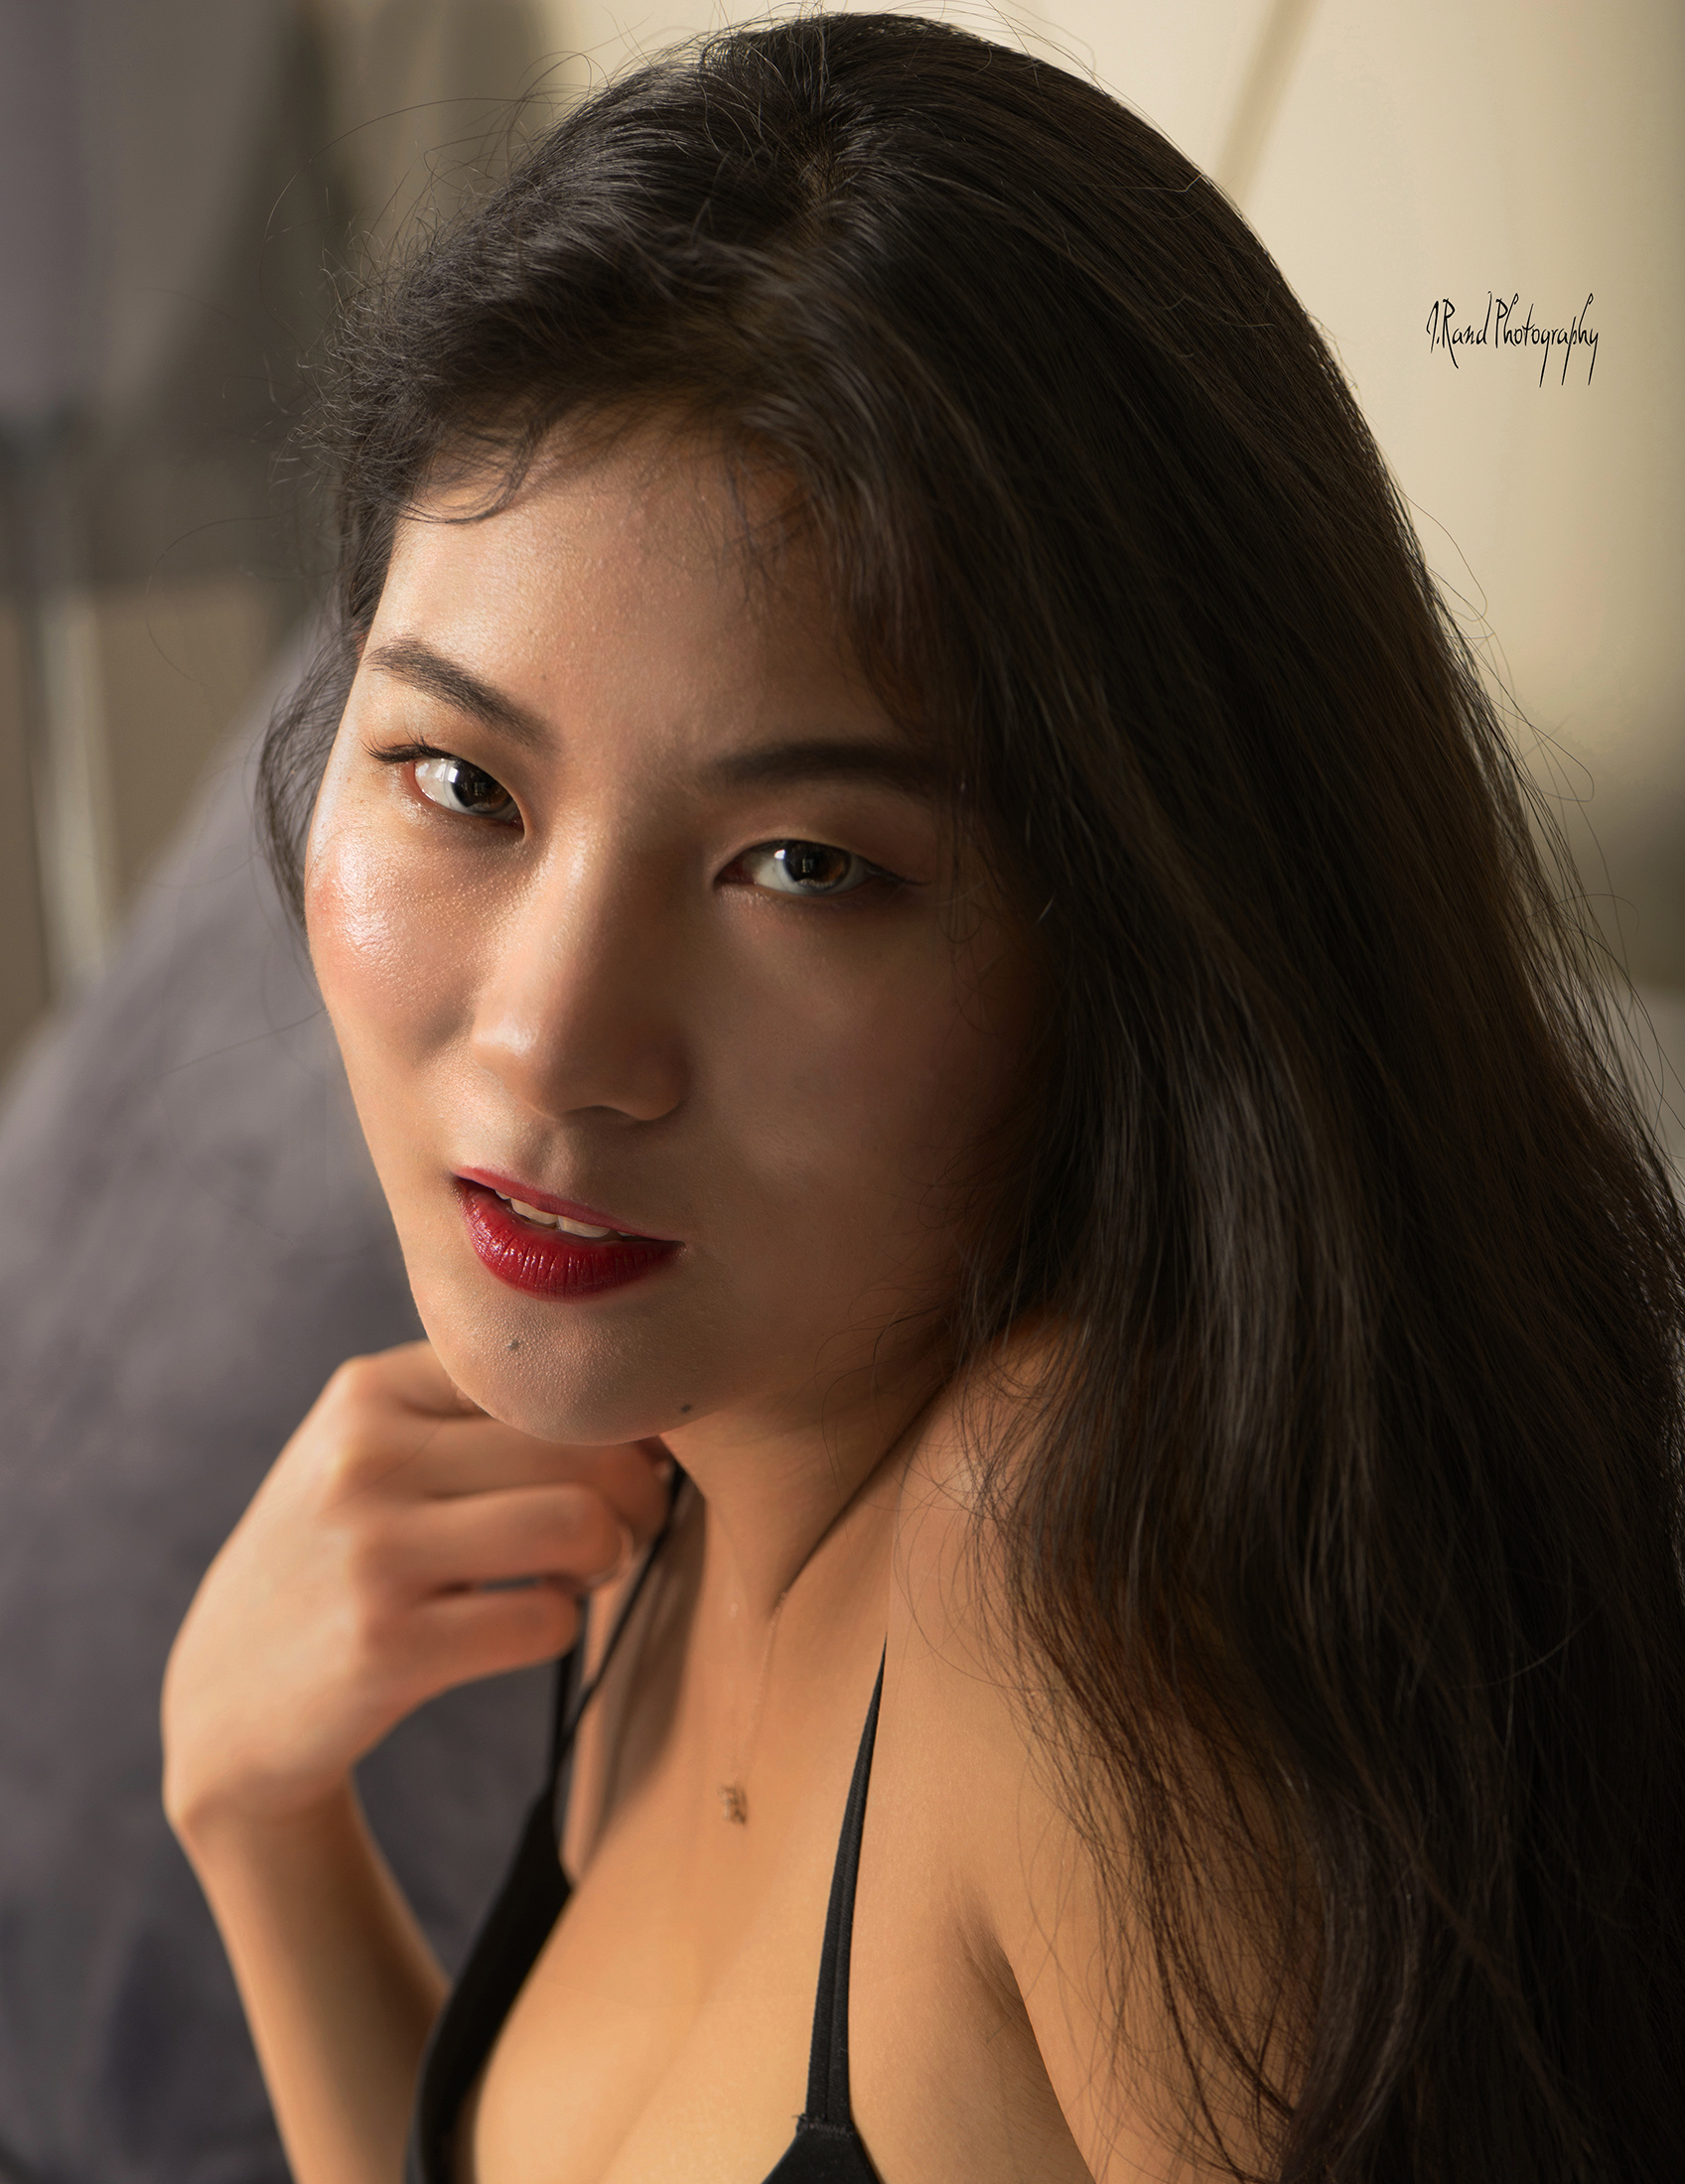 Mina IG songblabla, Korean Model